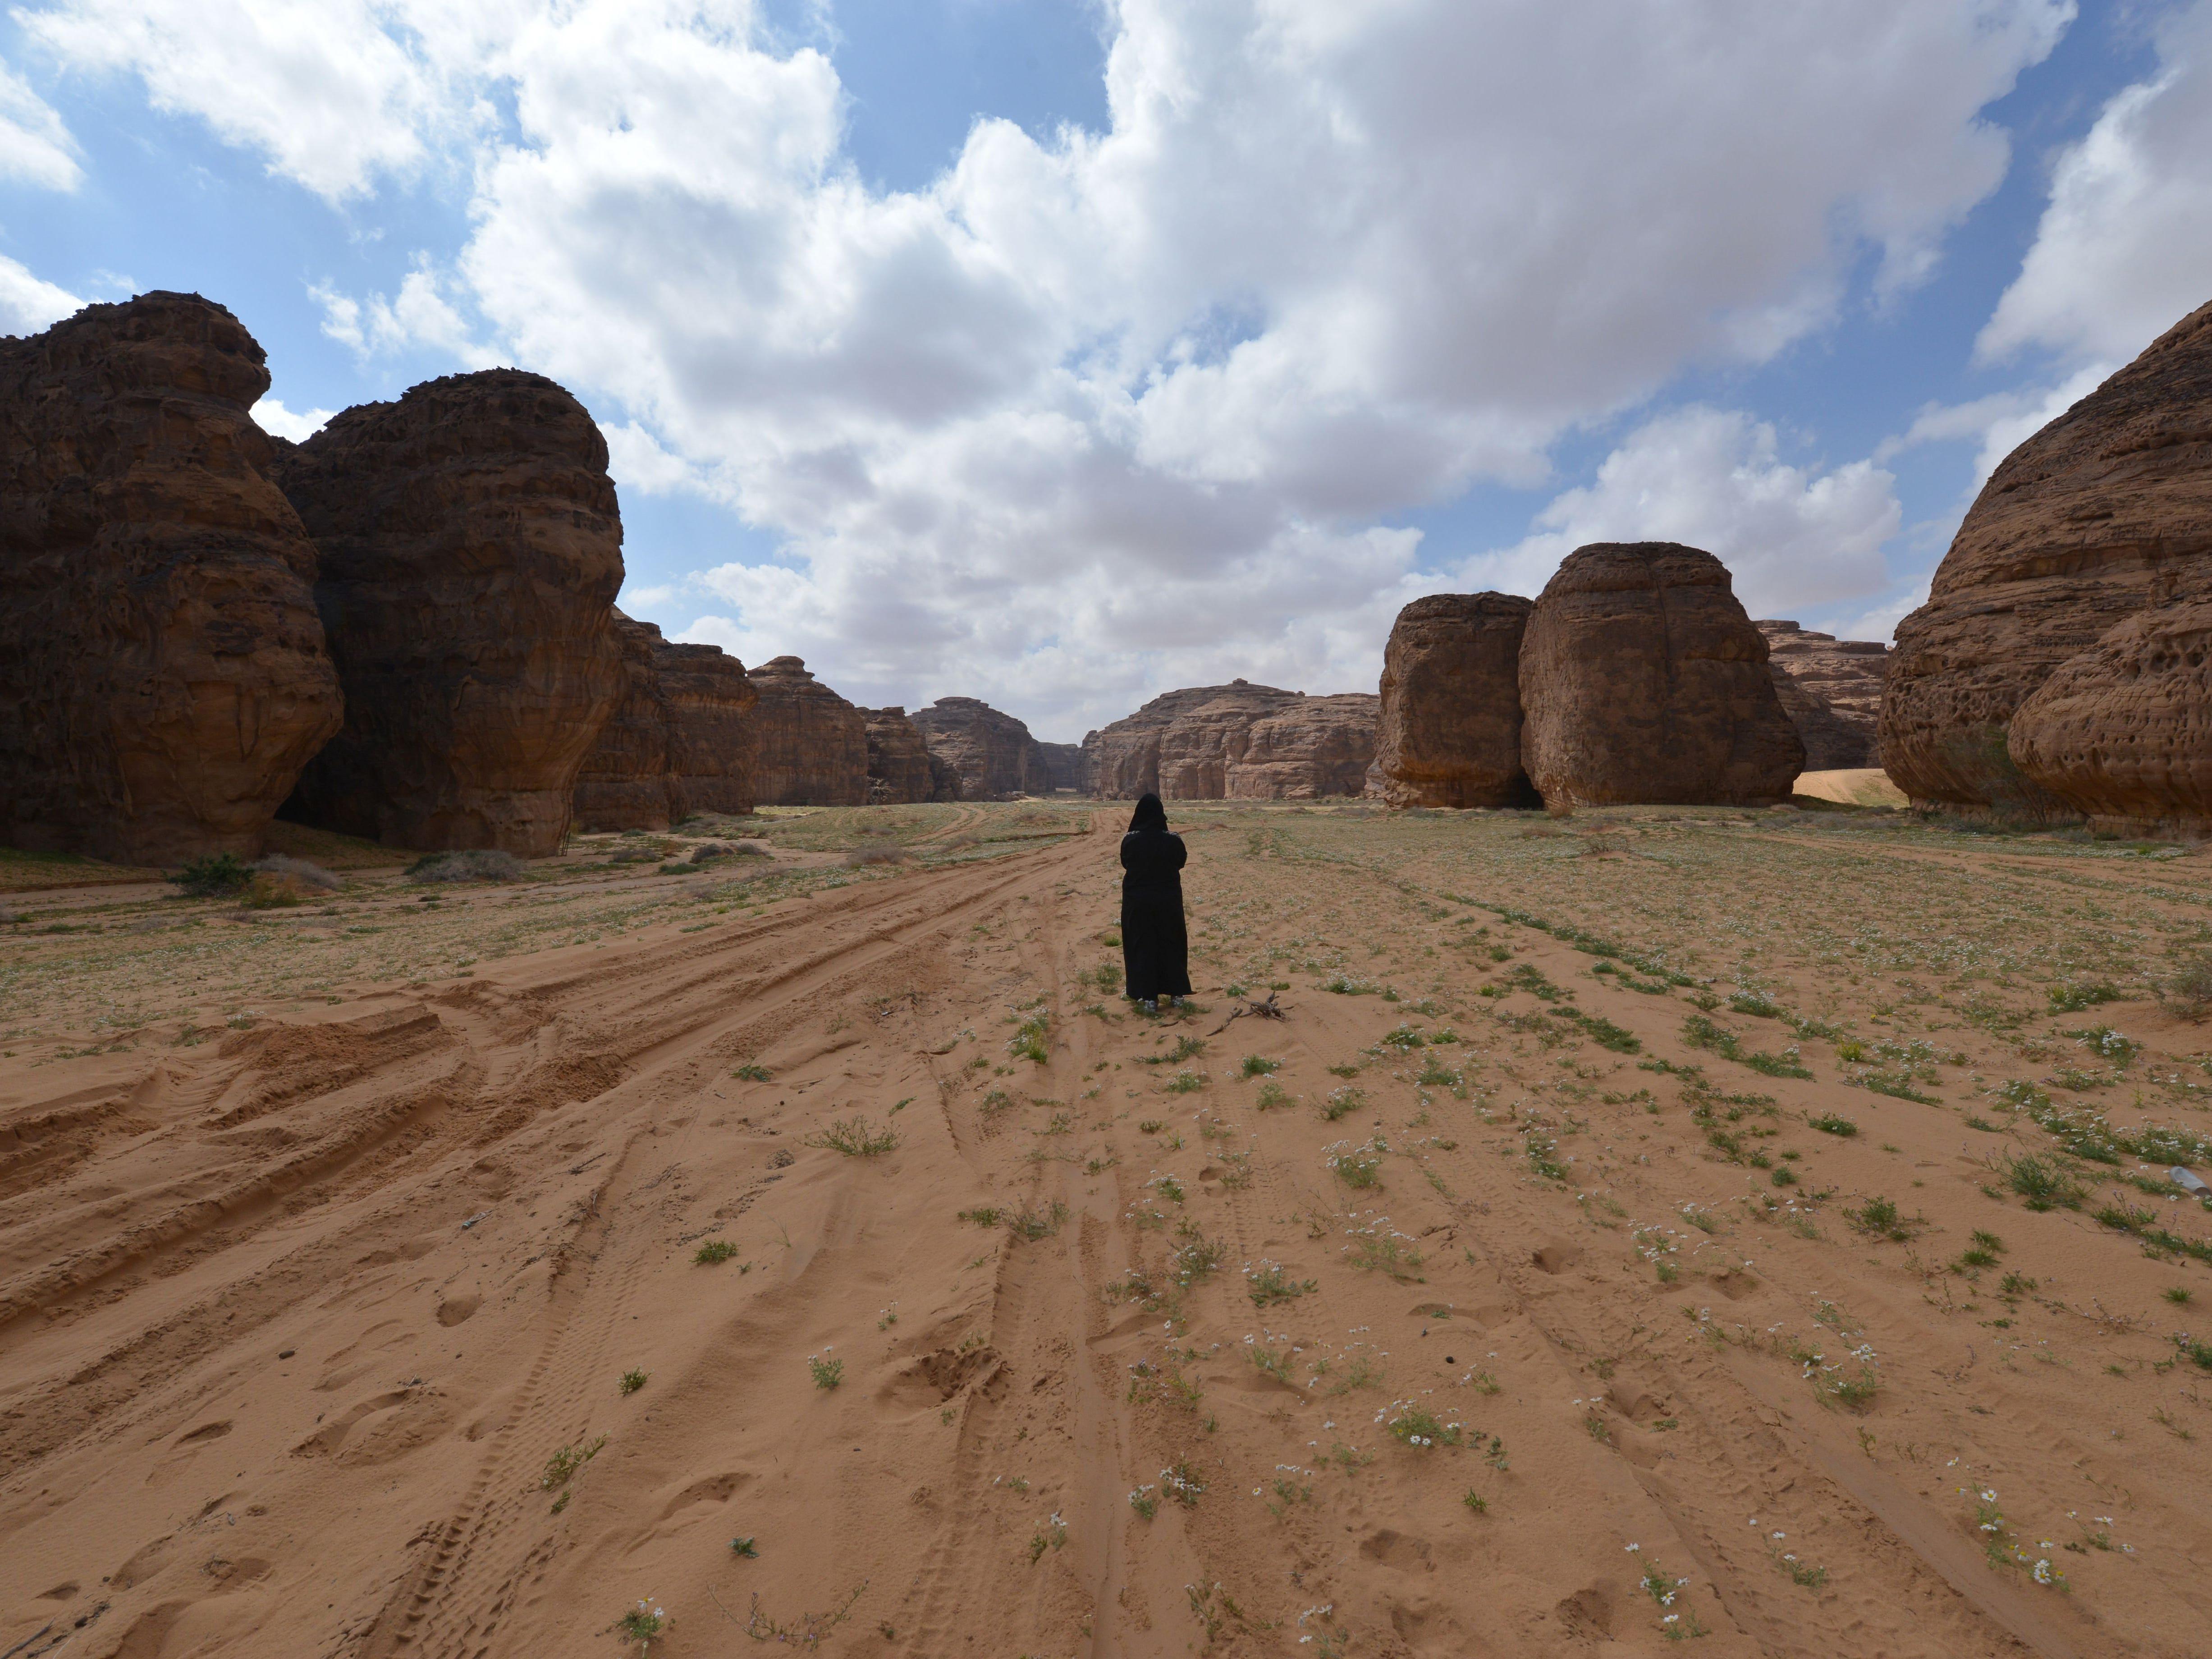 A woman walks in the Sharaan Nature Reserve near the town of al-Ula in northwestern Saudi Arabia on Feb. 11, 2019.